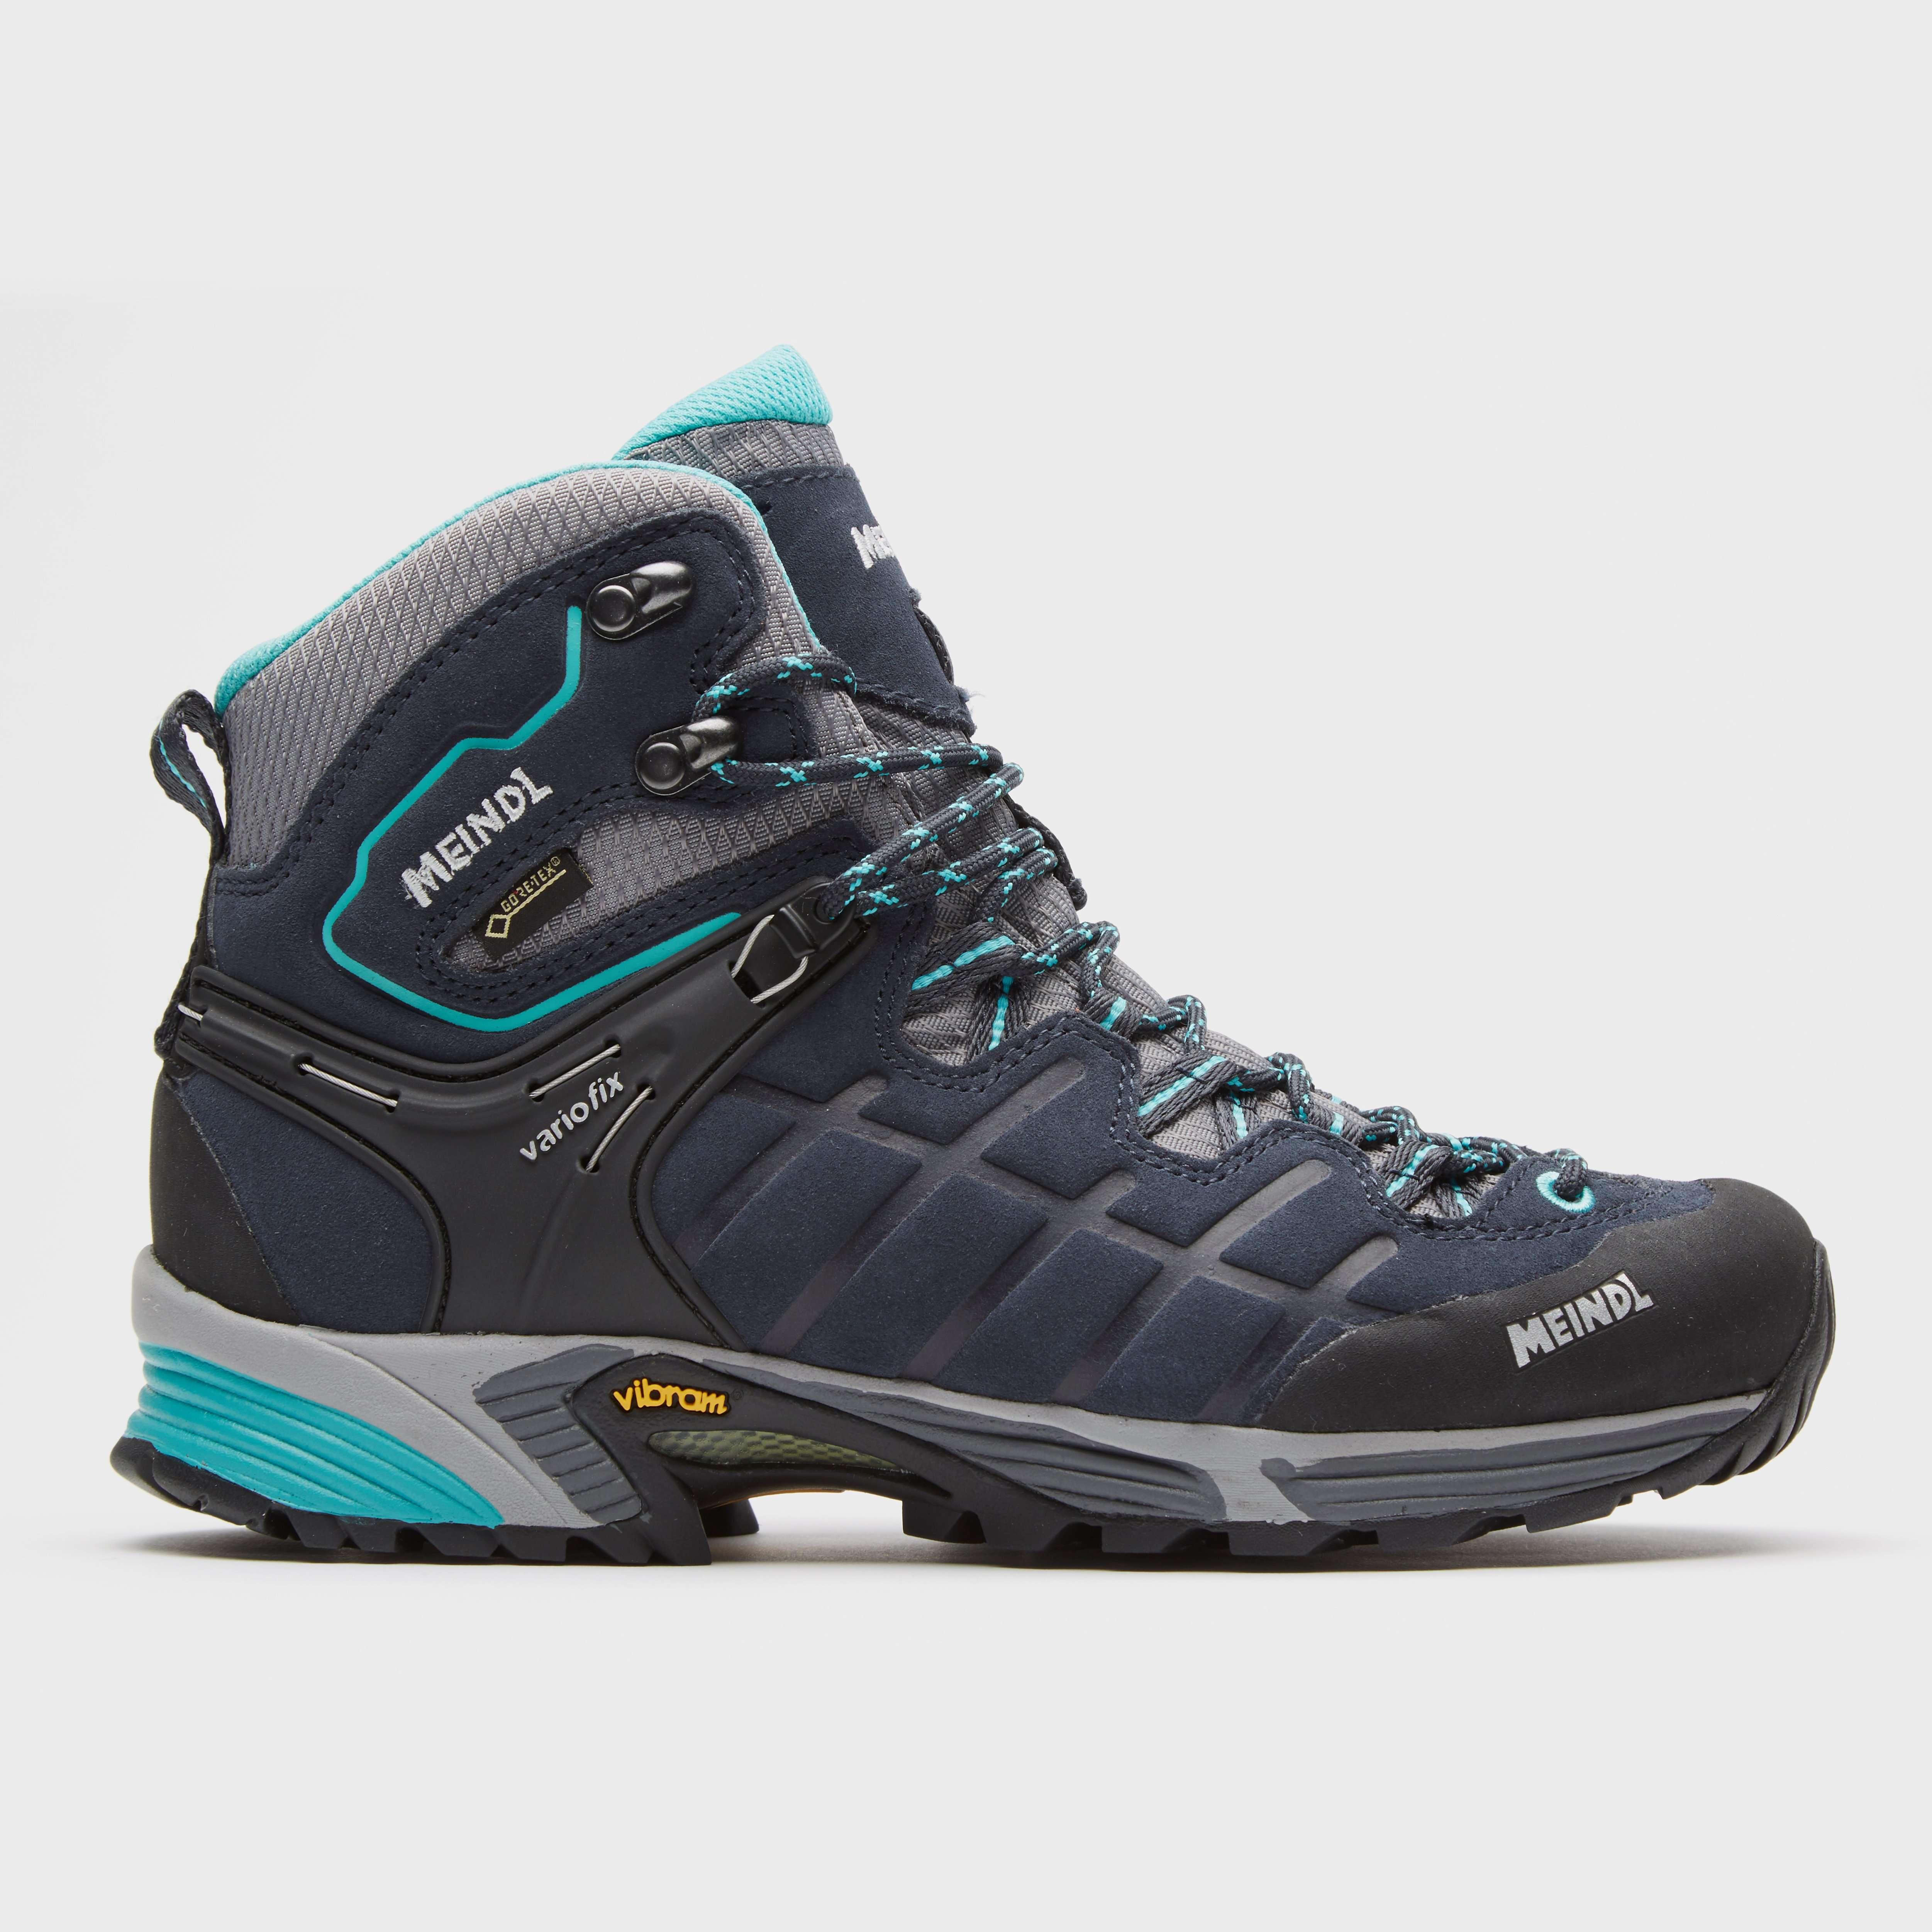 MEINDL Women's Kapstadt GORE-TEX® Hiking Boots